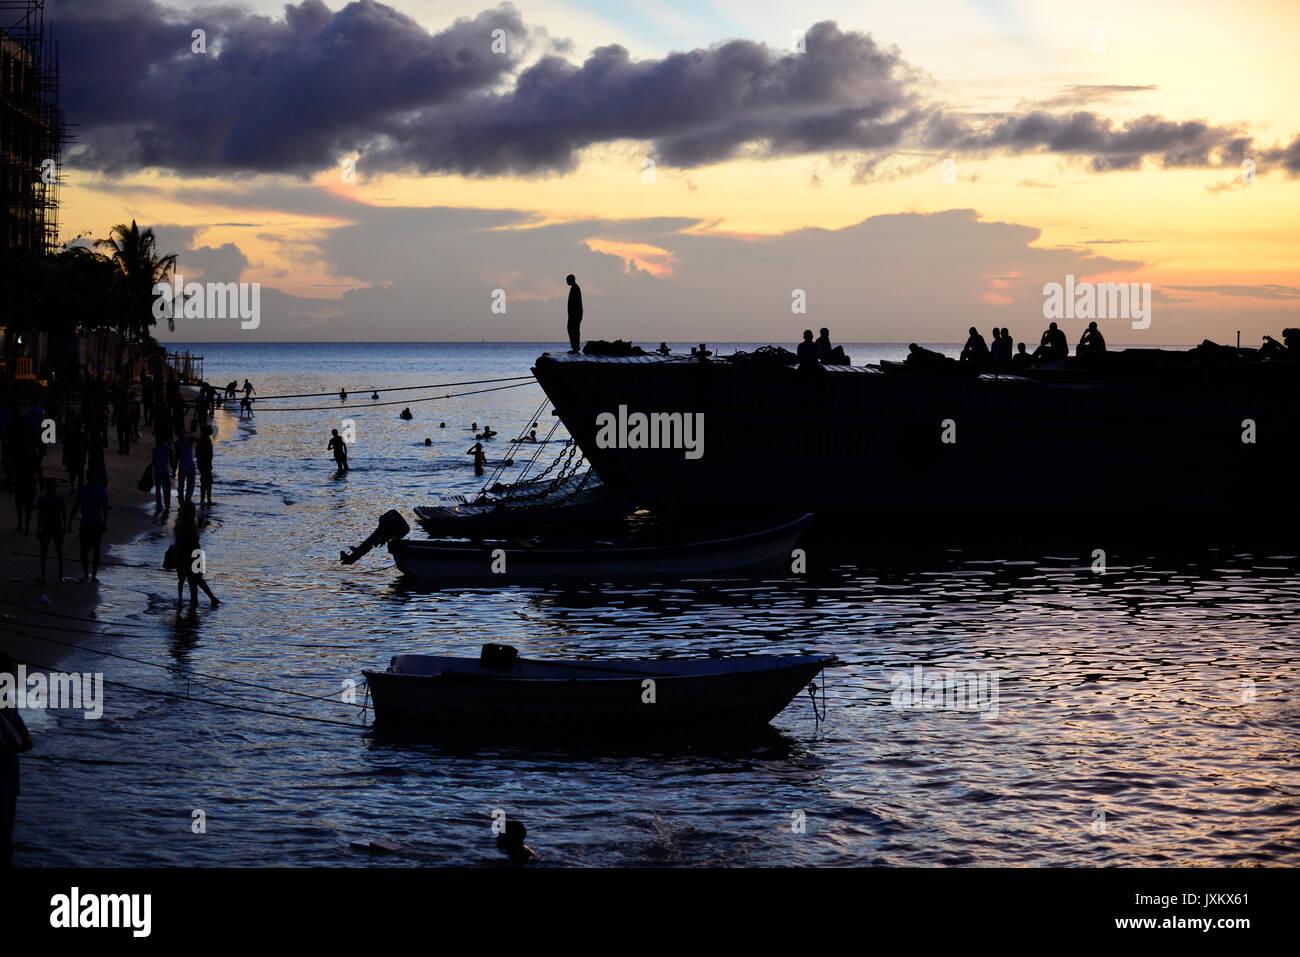 TANZANIA Zanzibar, Stone town, evening at sea, tanzanian navy ship / TANSANIA Insel Sansibar, Stonetown, abends am Meer, Schiff der tansanischen Marine - Stock Image